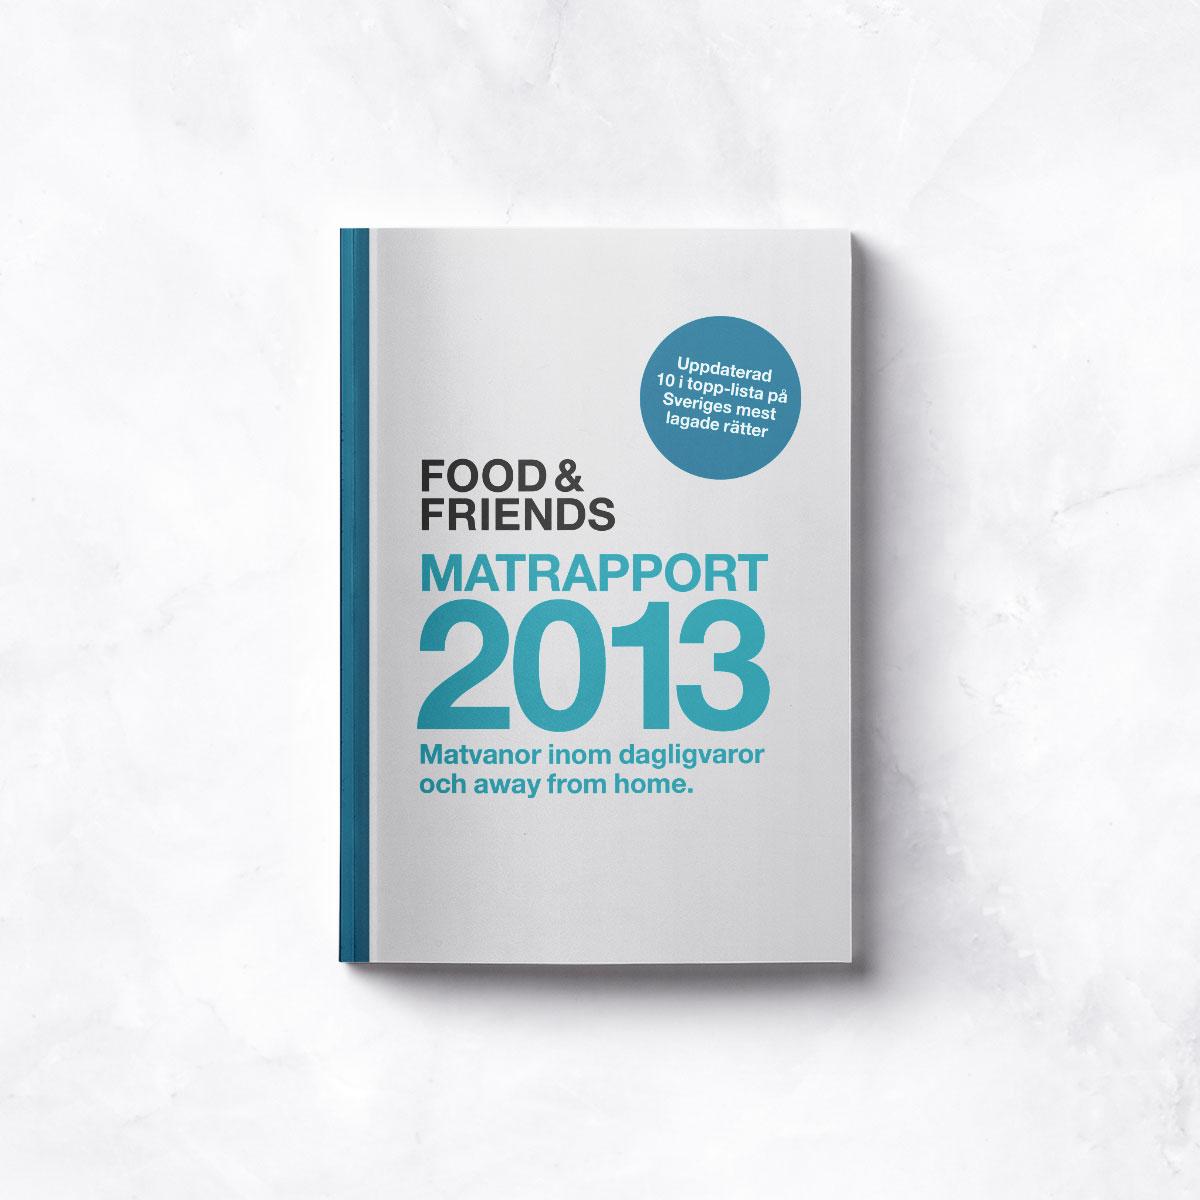 Matrapport 2013